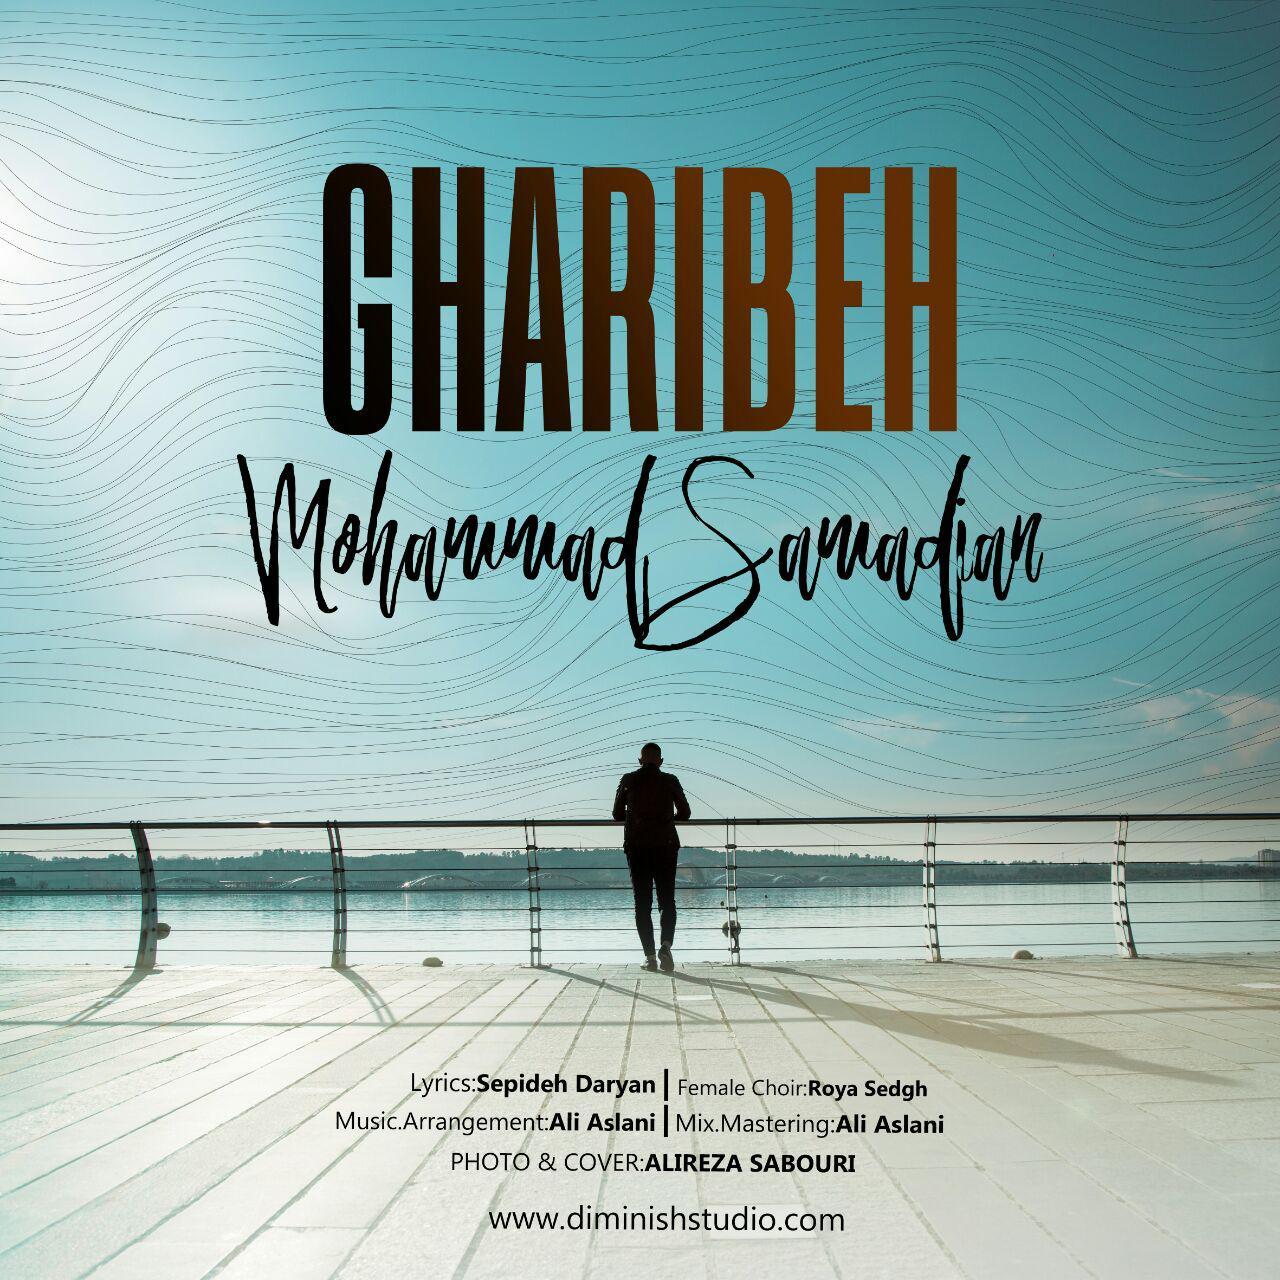 Mohammad Samadian – Gharibeh